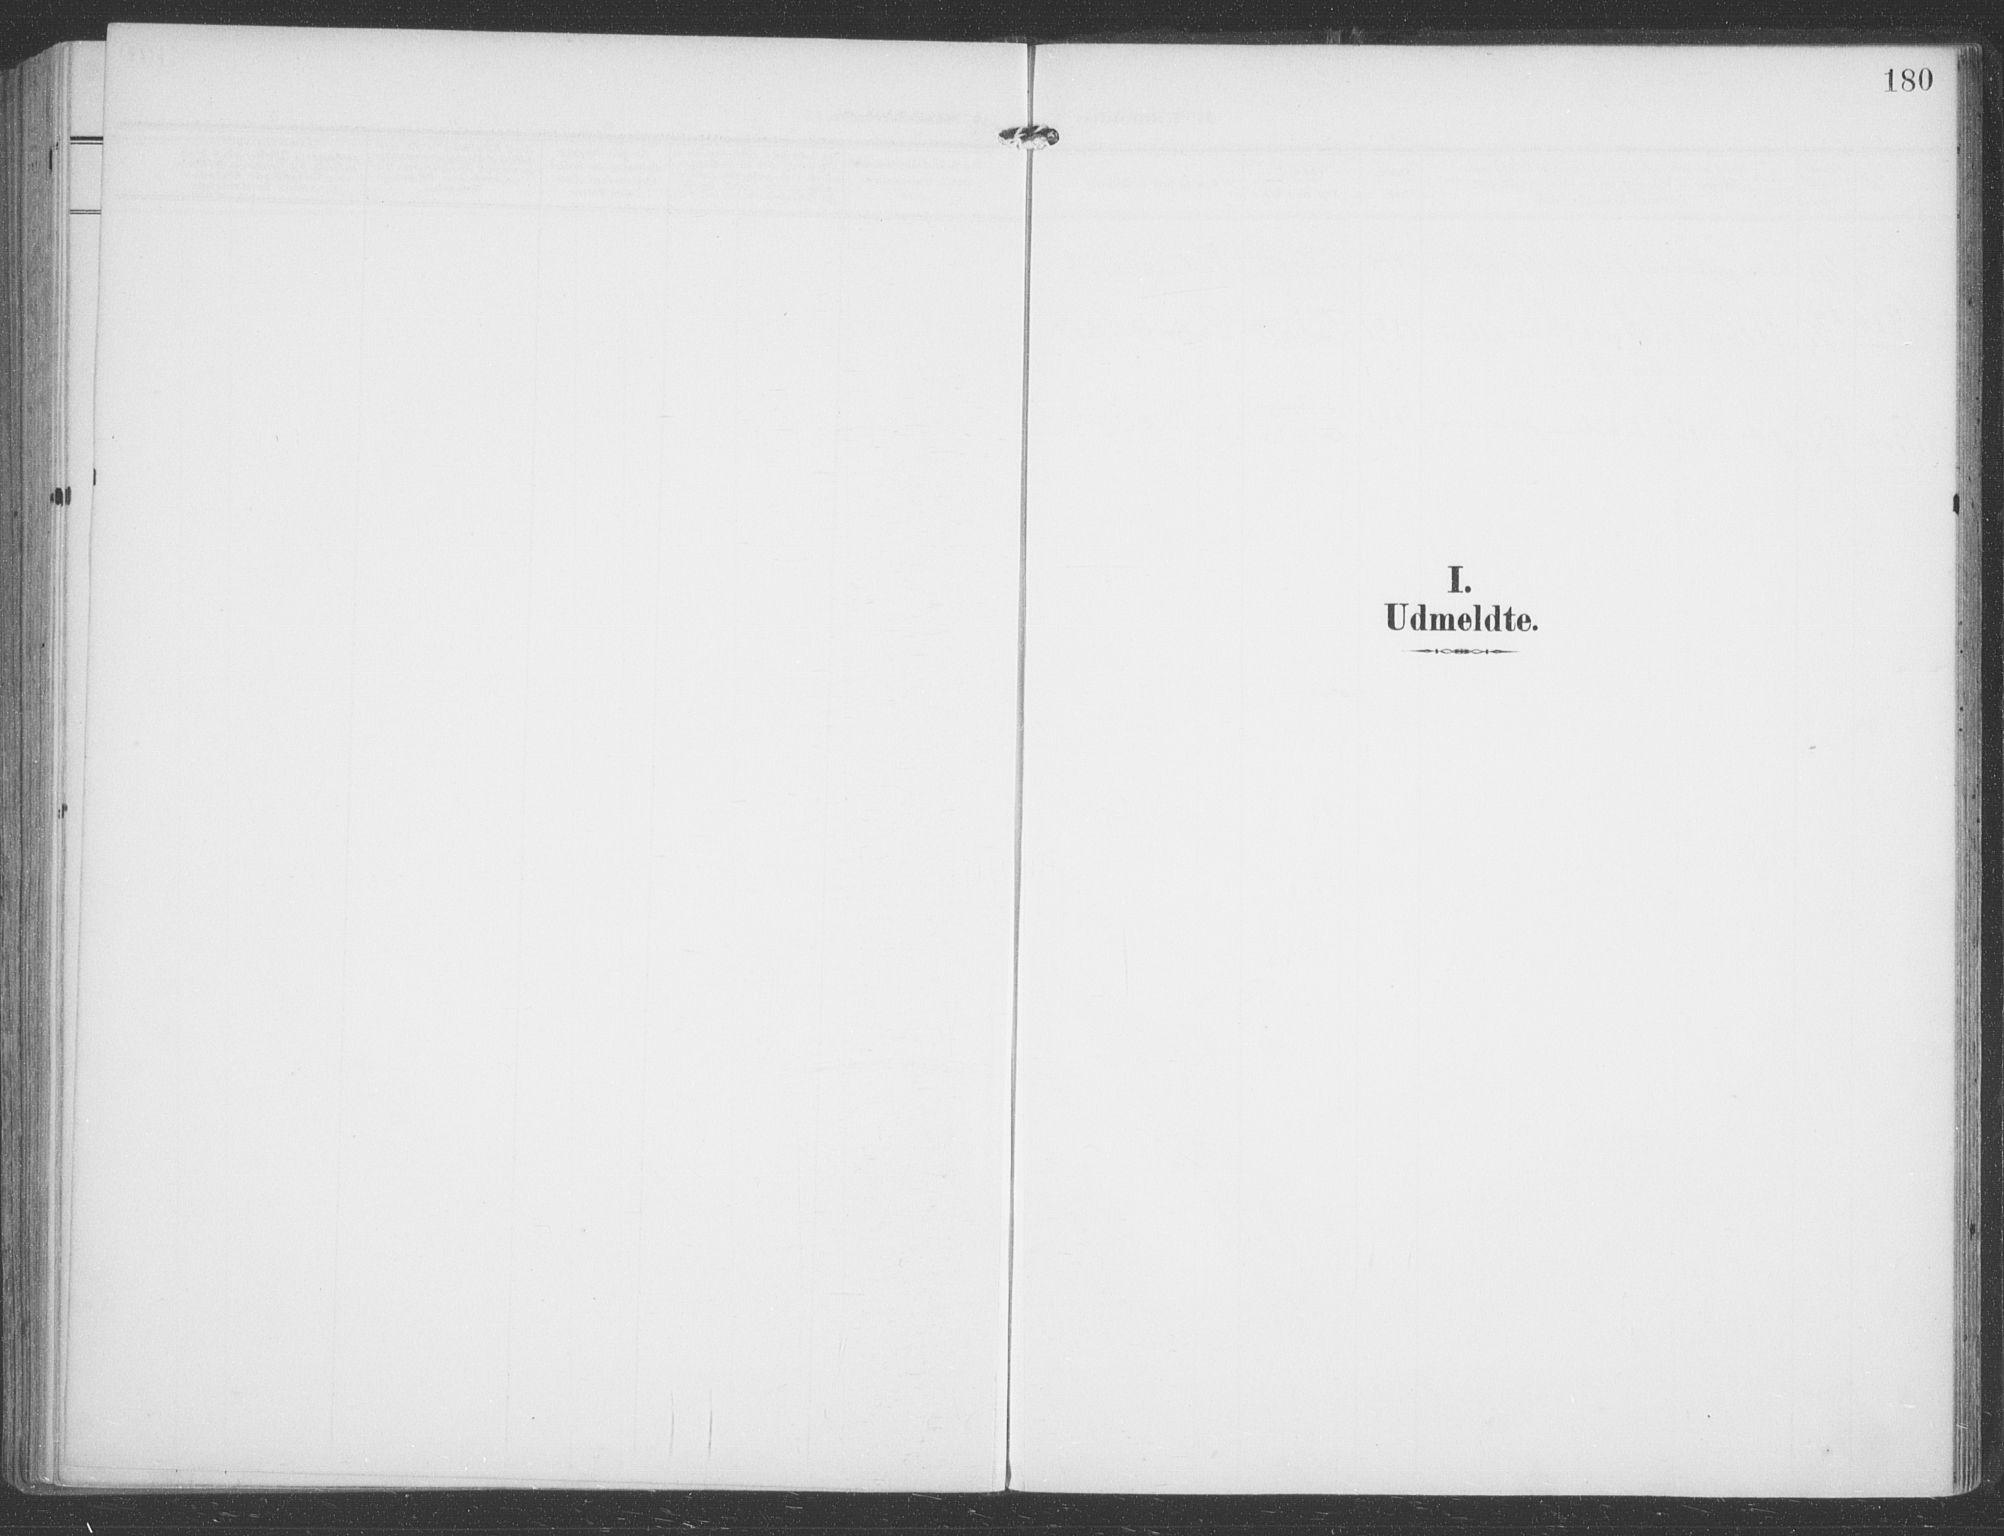 SATØ, Talvik sokneprestkontor, H/Ha/L0017kirke: Ministerialbok nr. 17, 1906-1915, s. 180